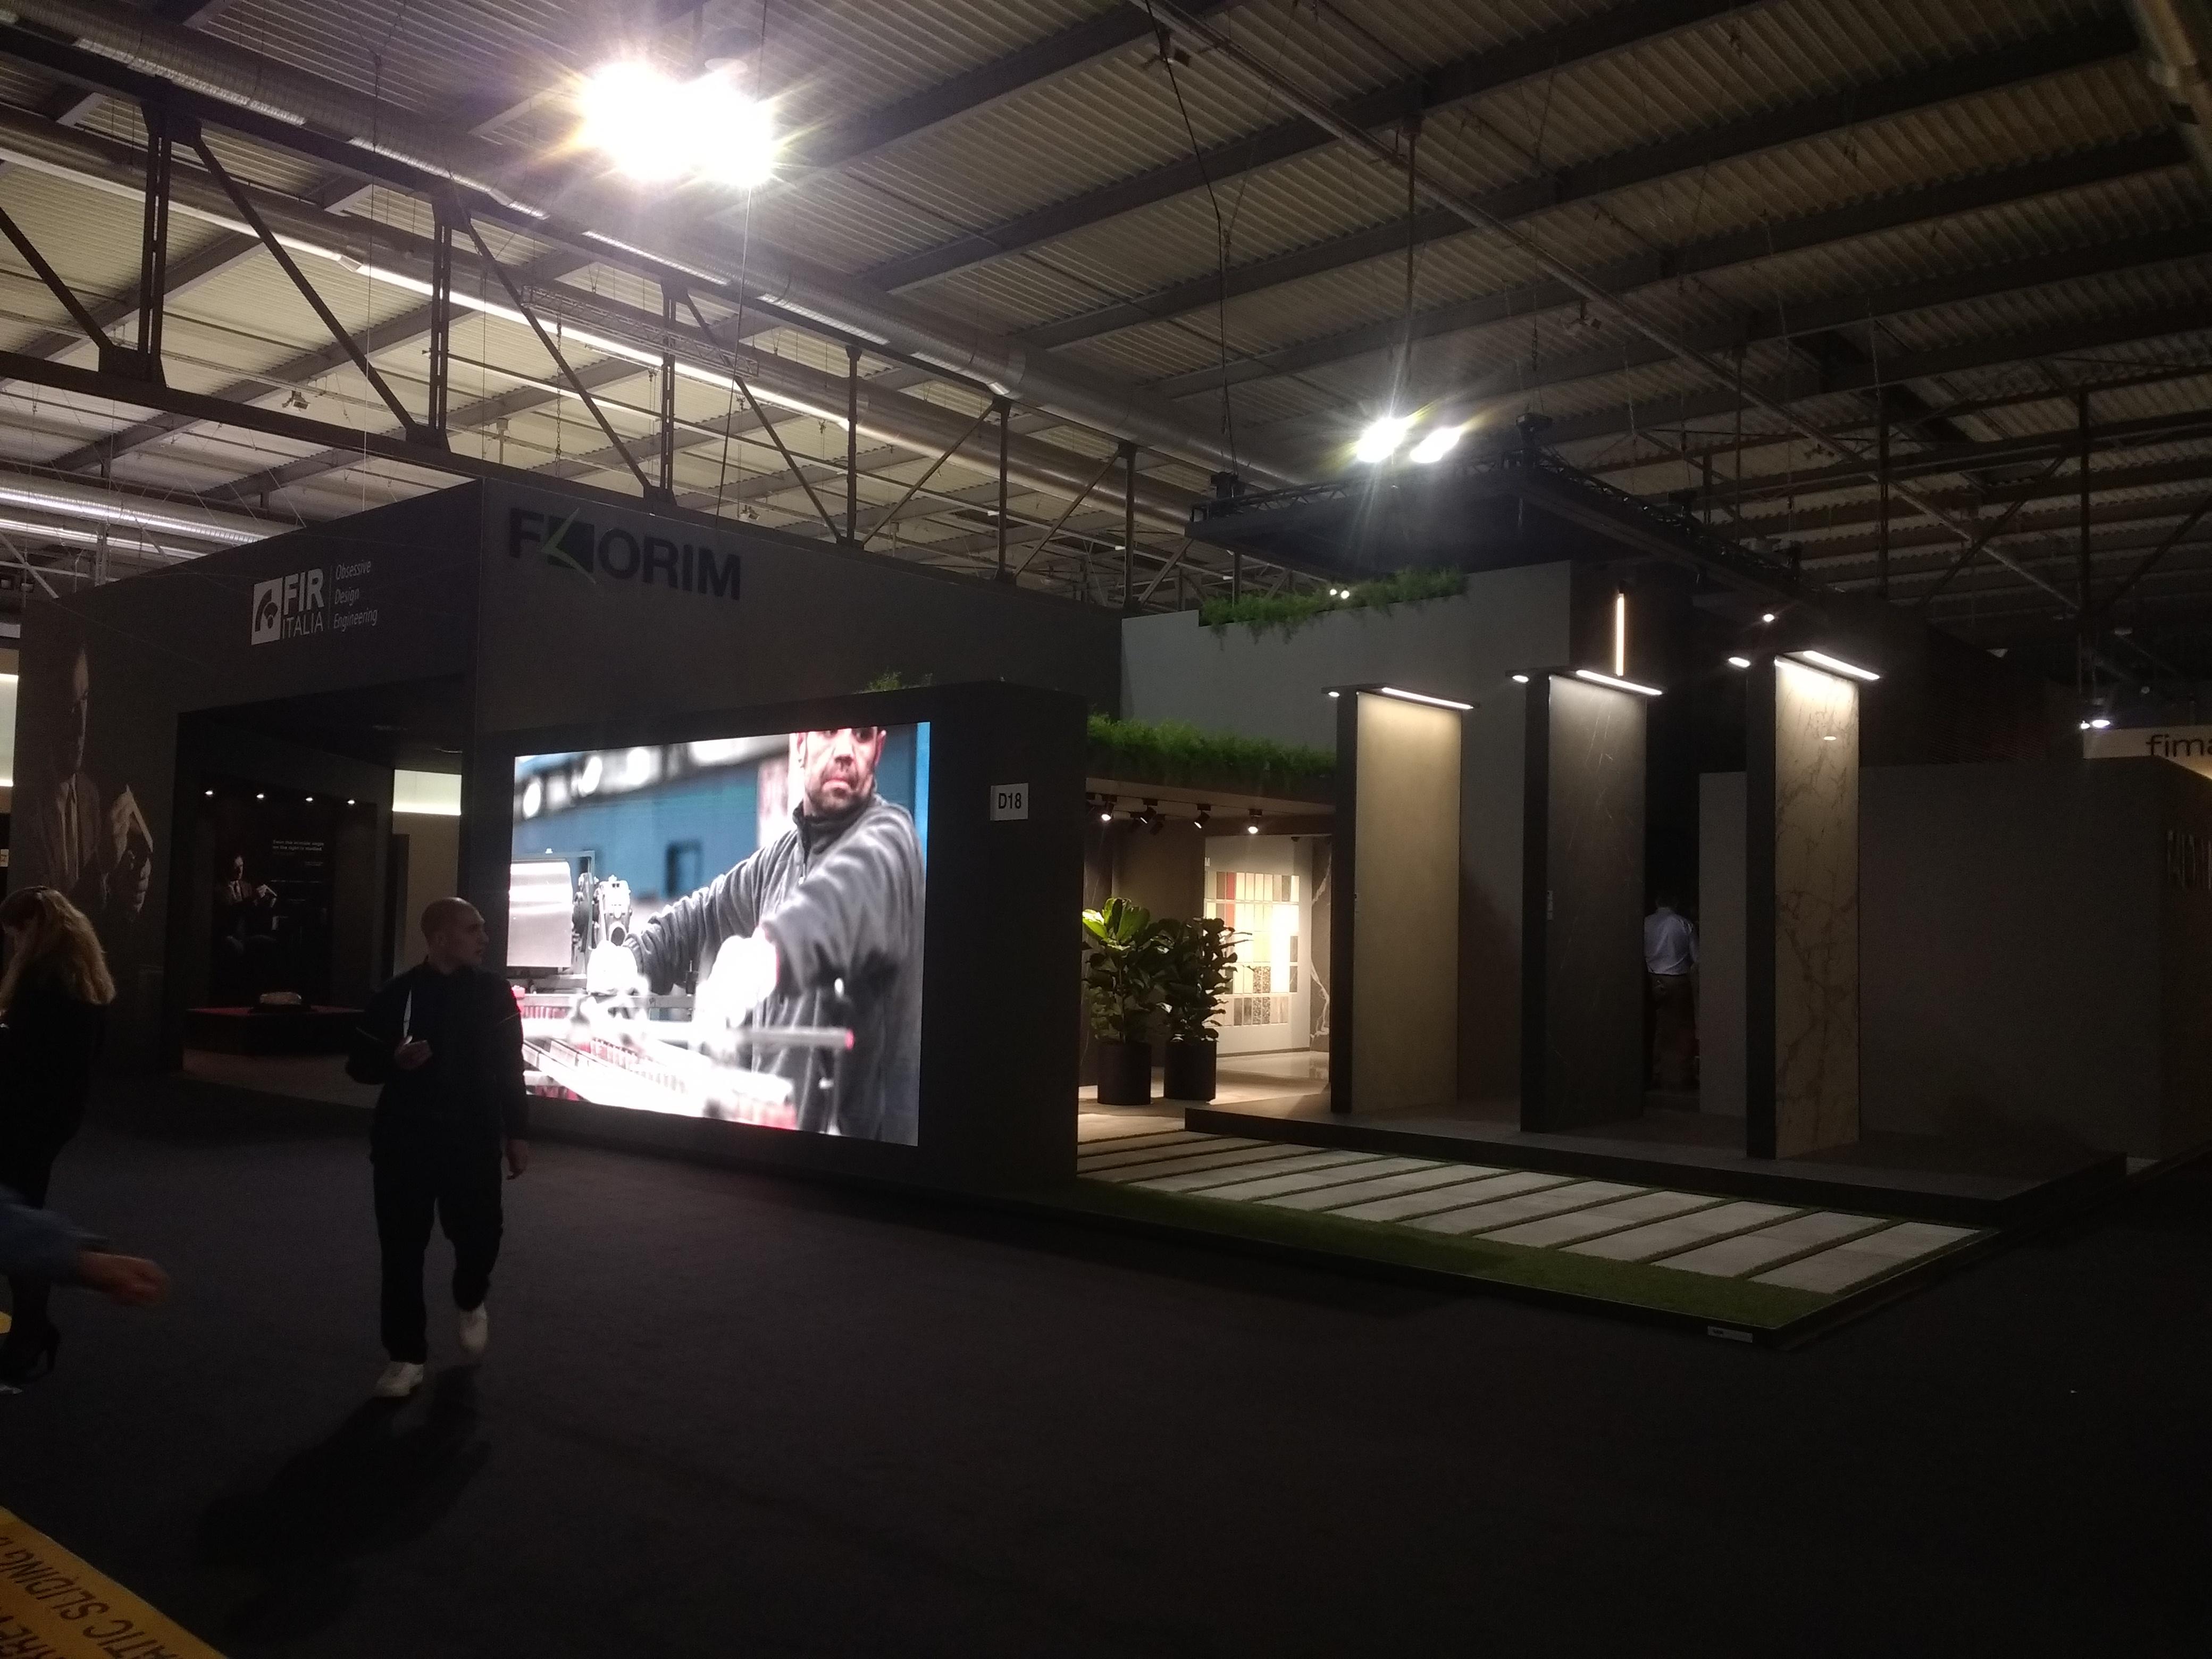 salone del mobile- ledwall florim-lorri